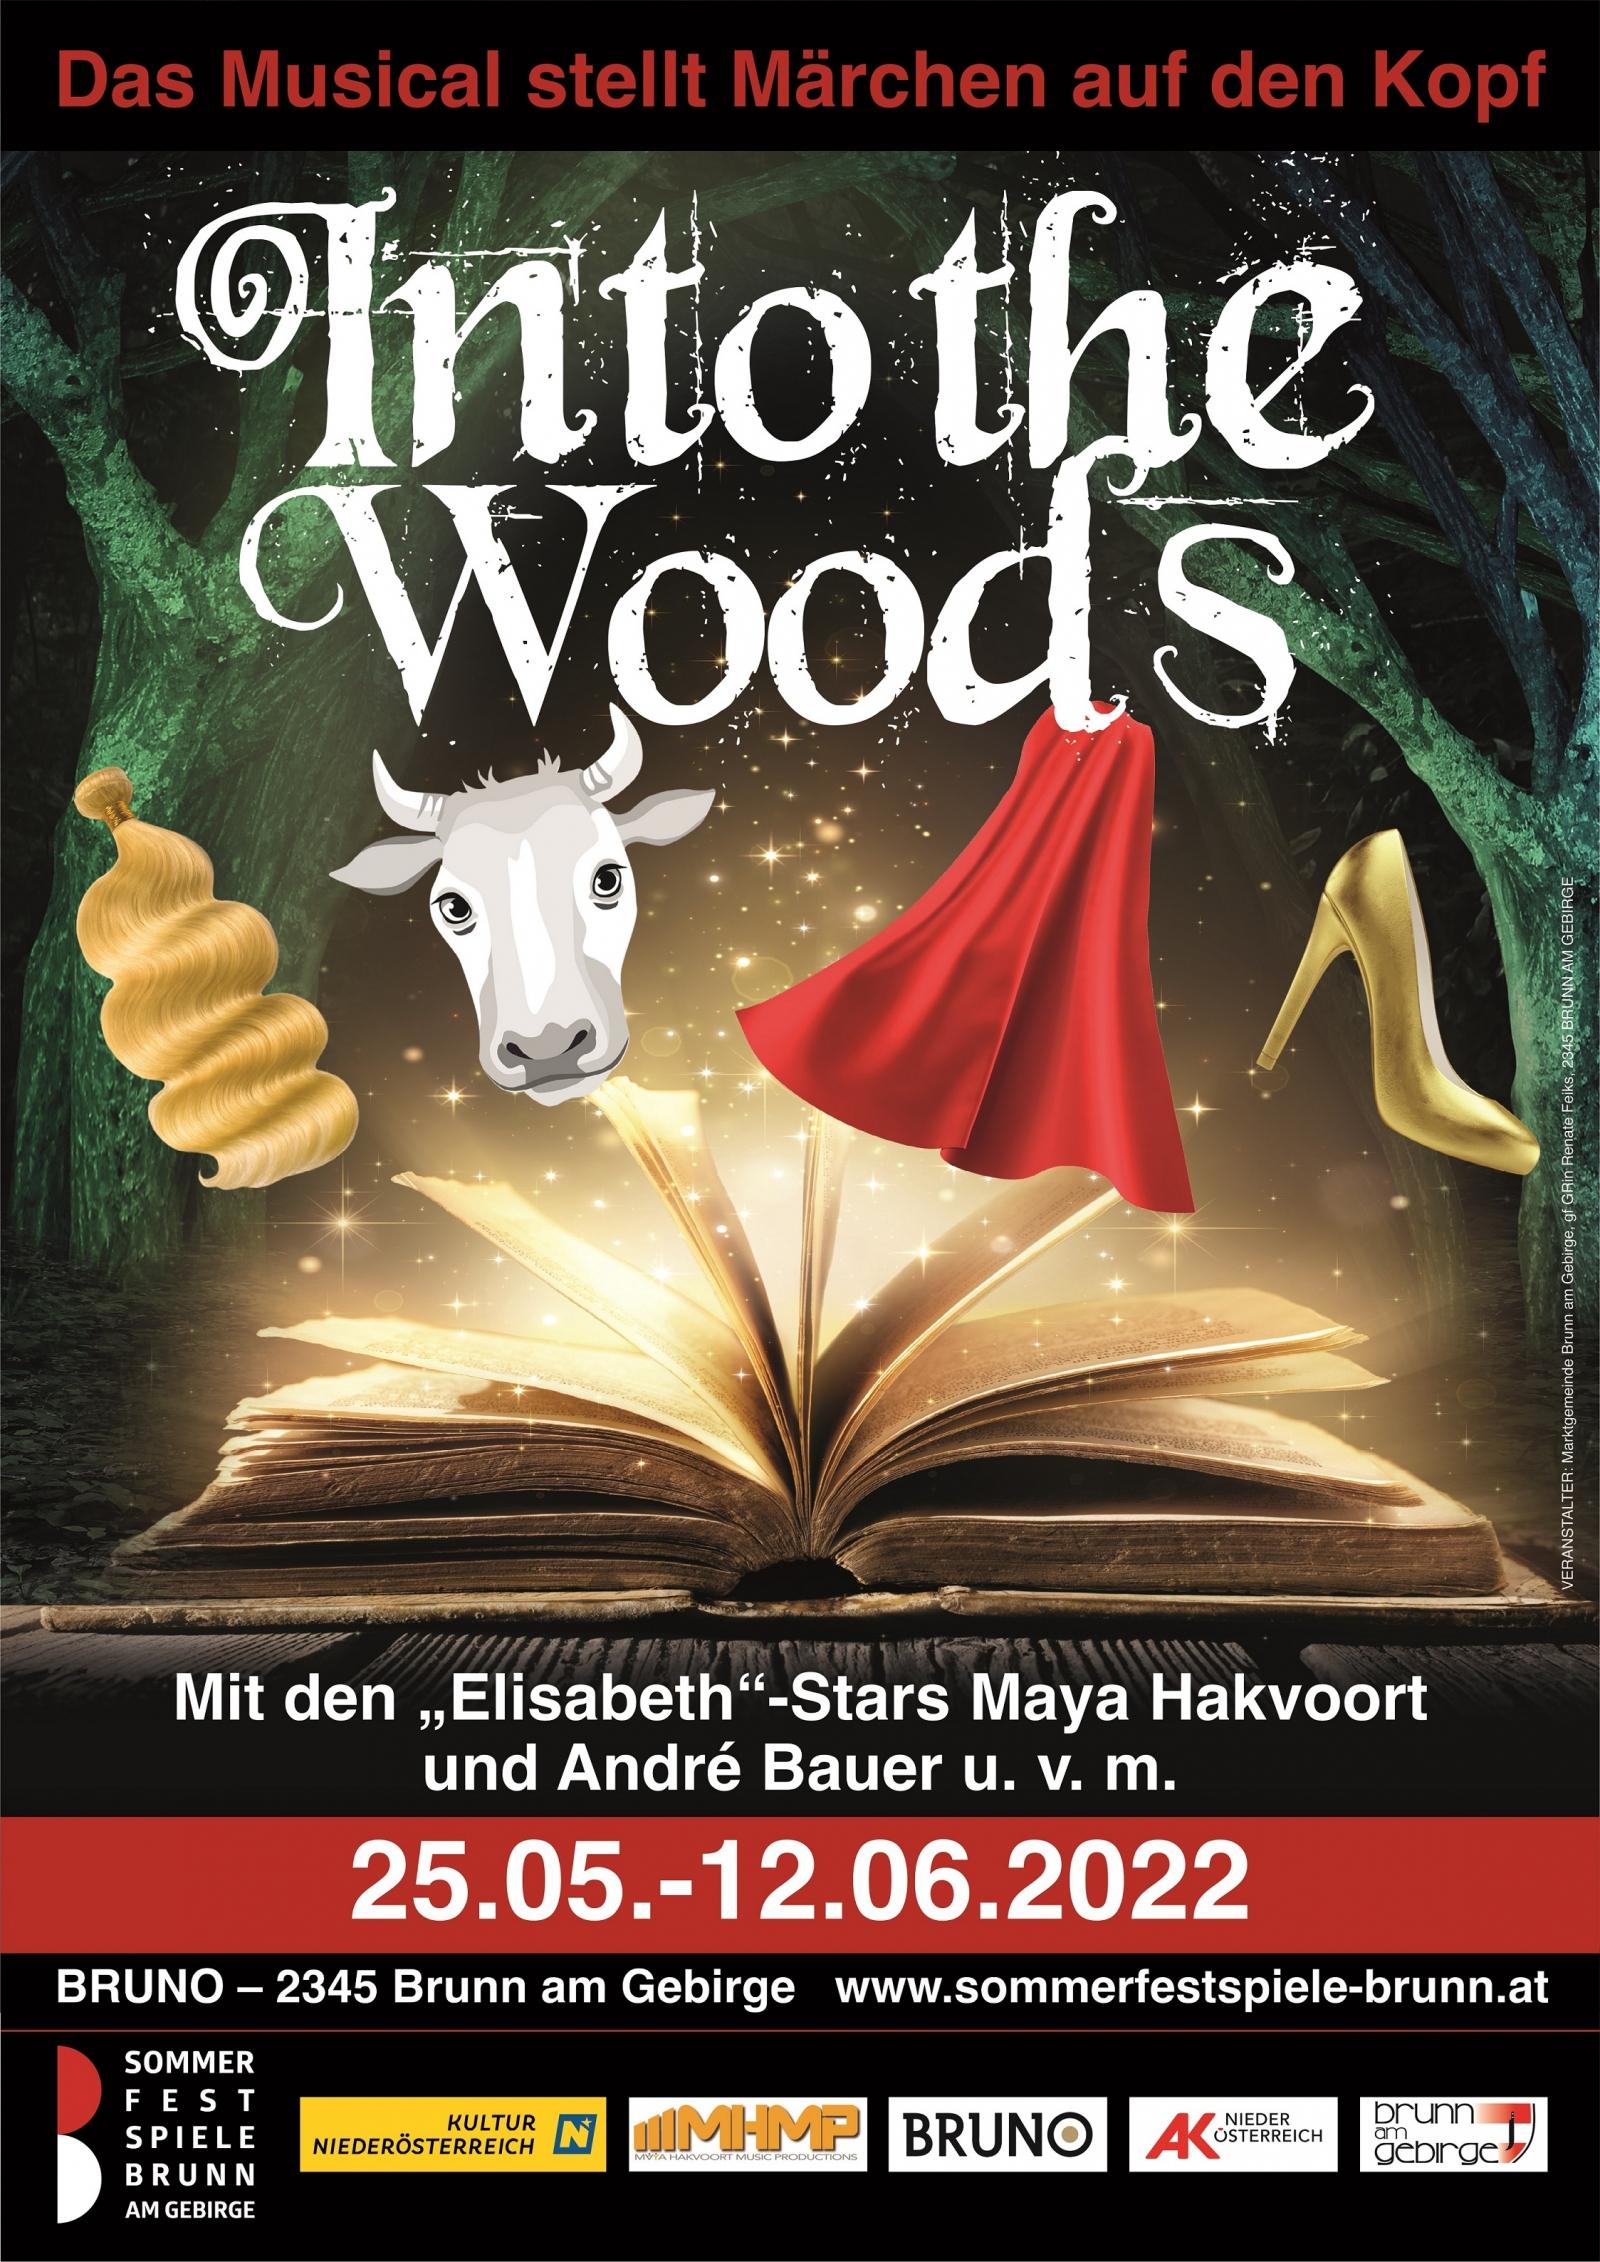 Into the Woods - Sommerfestspiele Brunn am Gebirge 2022